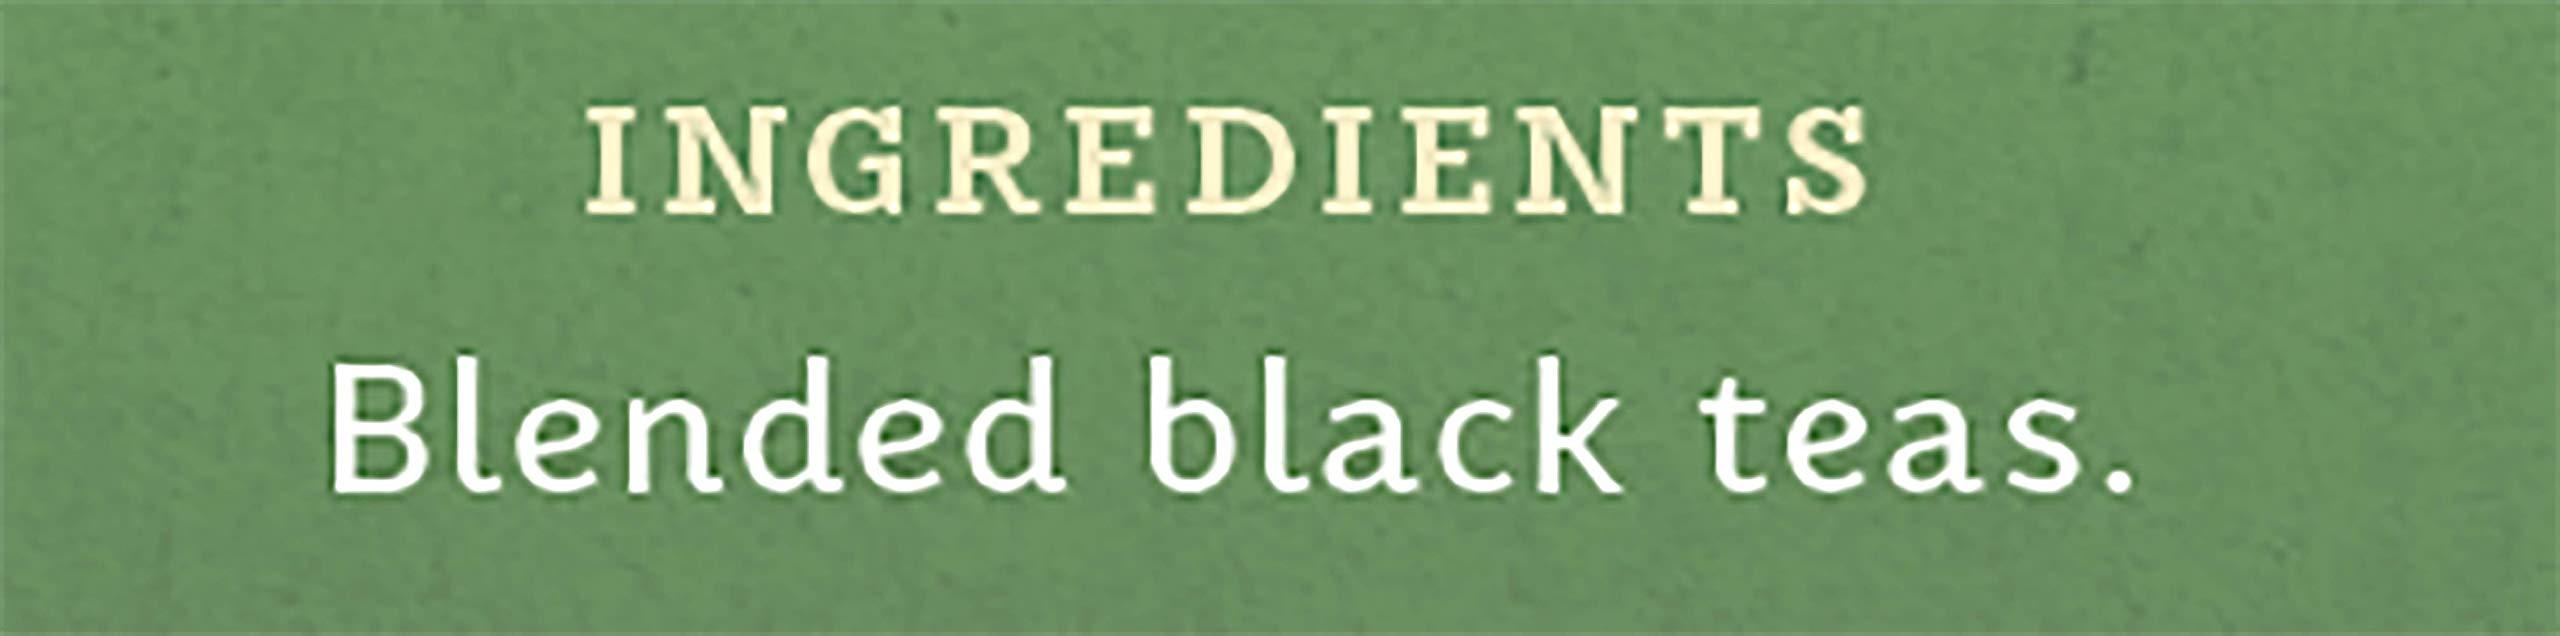 Stash Tea Super Irish Breakfast Black Tea 1000 Tea Bags in 8.8 Pound Box Individual Black Tea Bags for Use in Teapots Mugs or Cups, Brew Hot Tea or Iced Tea by Stash Tea (Image #2)